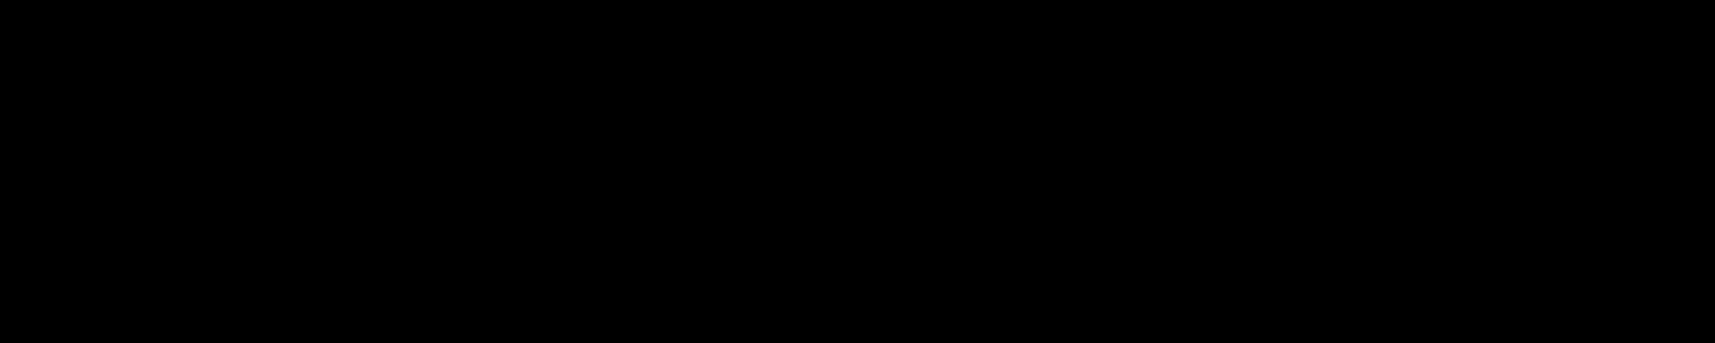 Dragon clan symbol